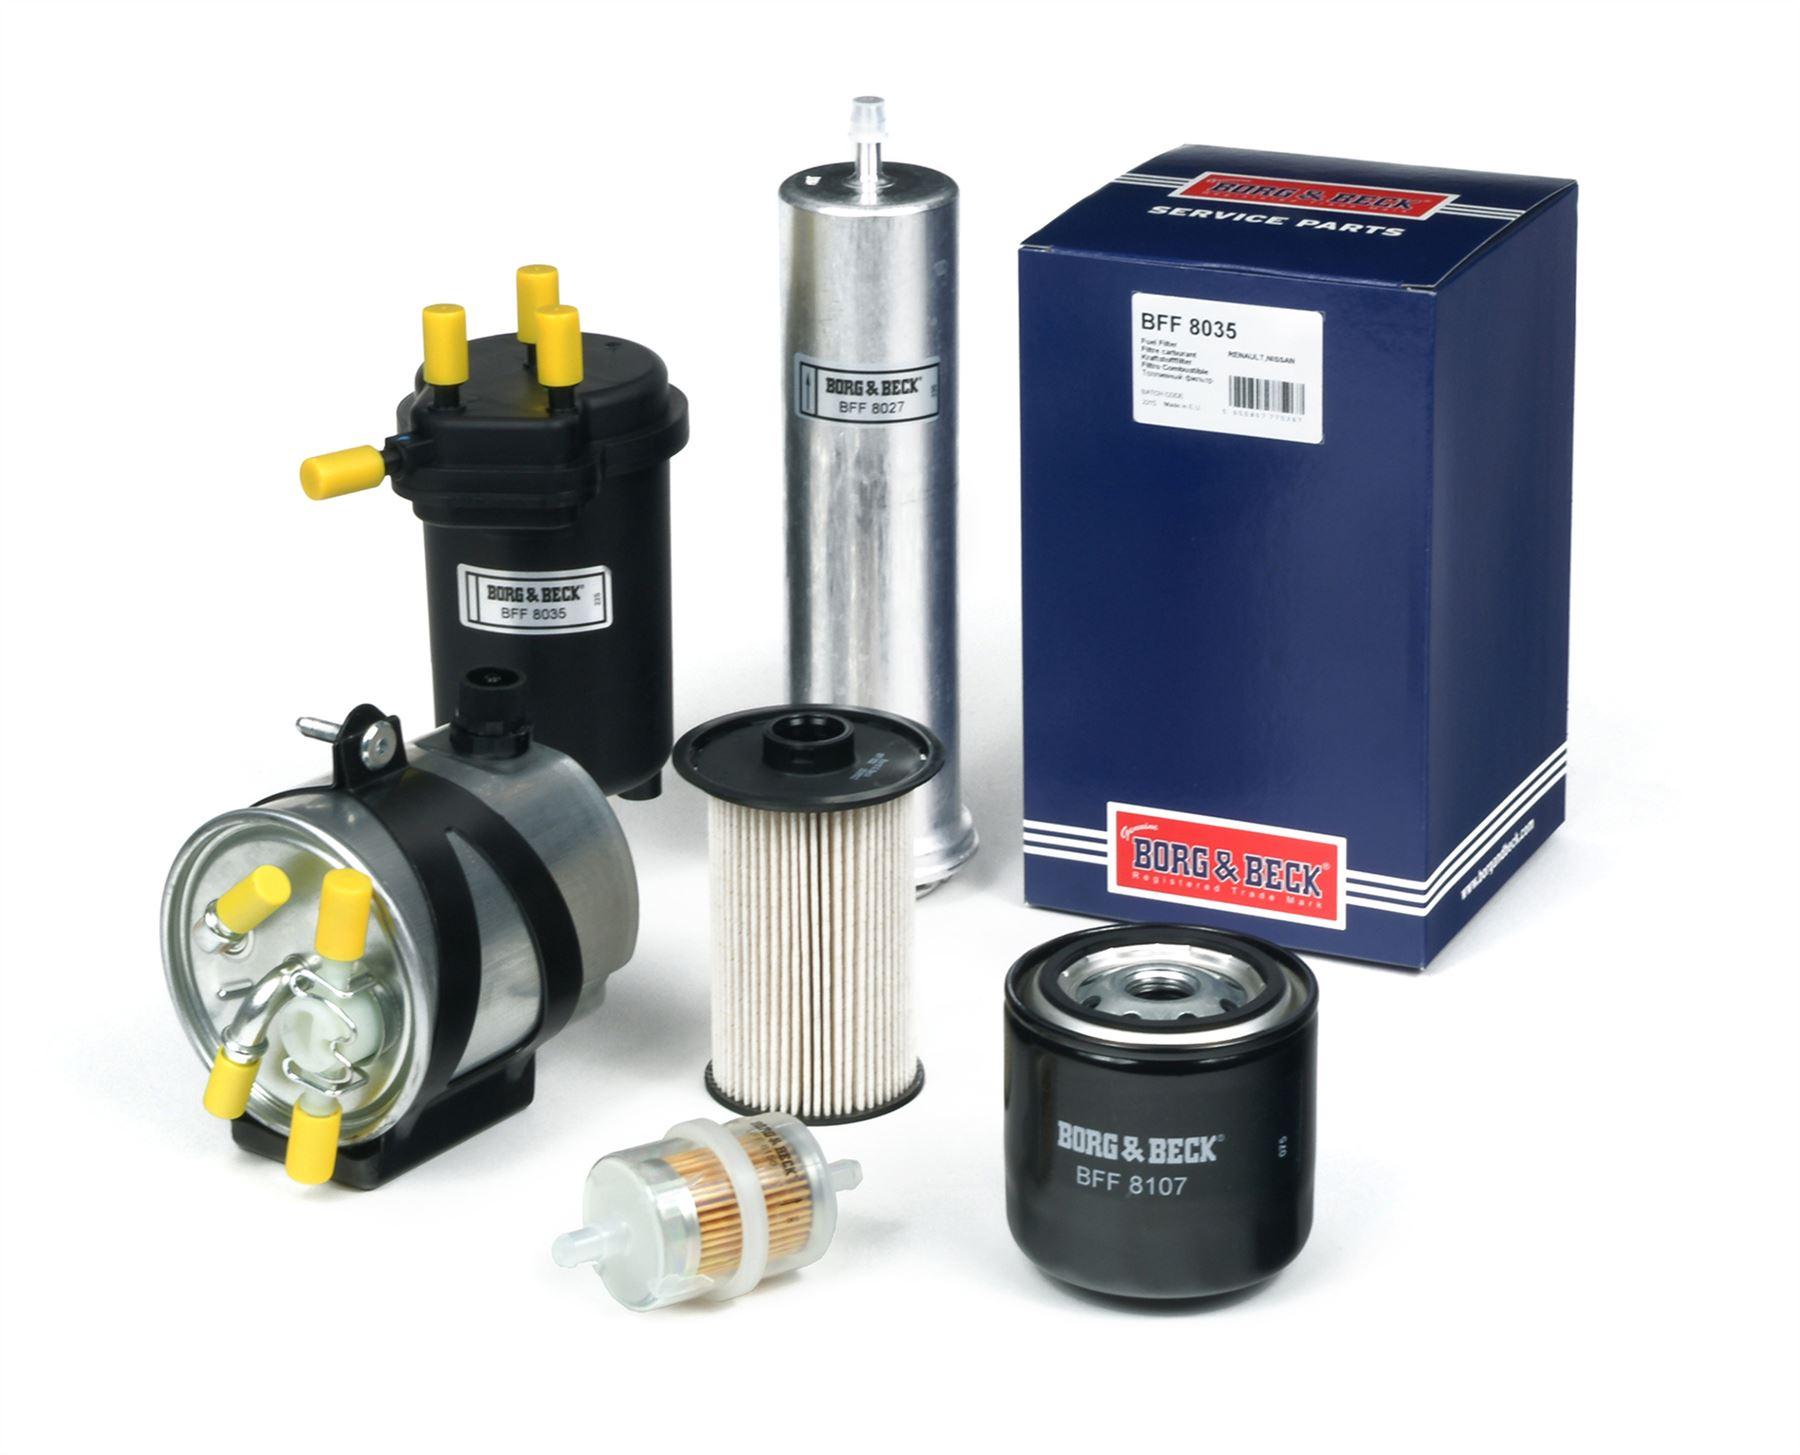 BORG /& BECK OIL FILTER FOR RENAULT MASTER BOX 2.5 74KW